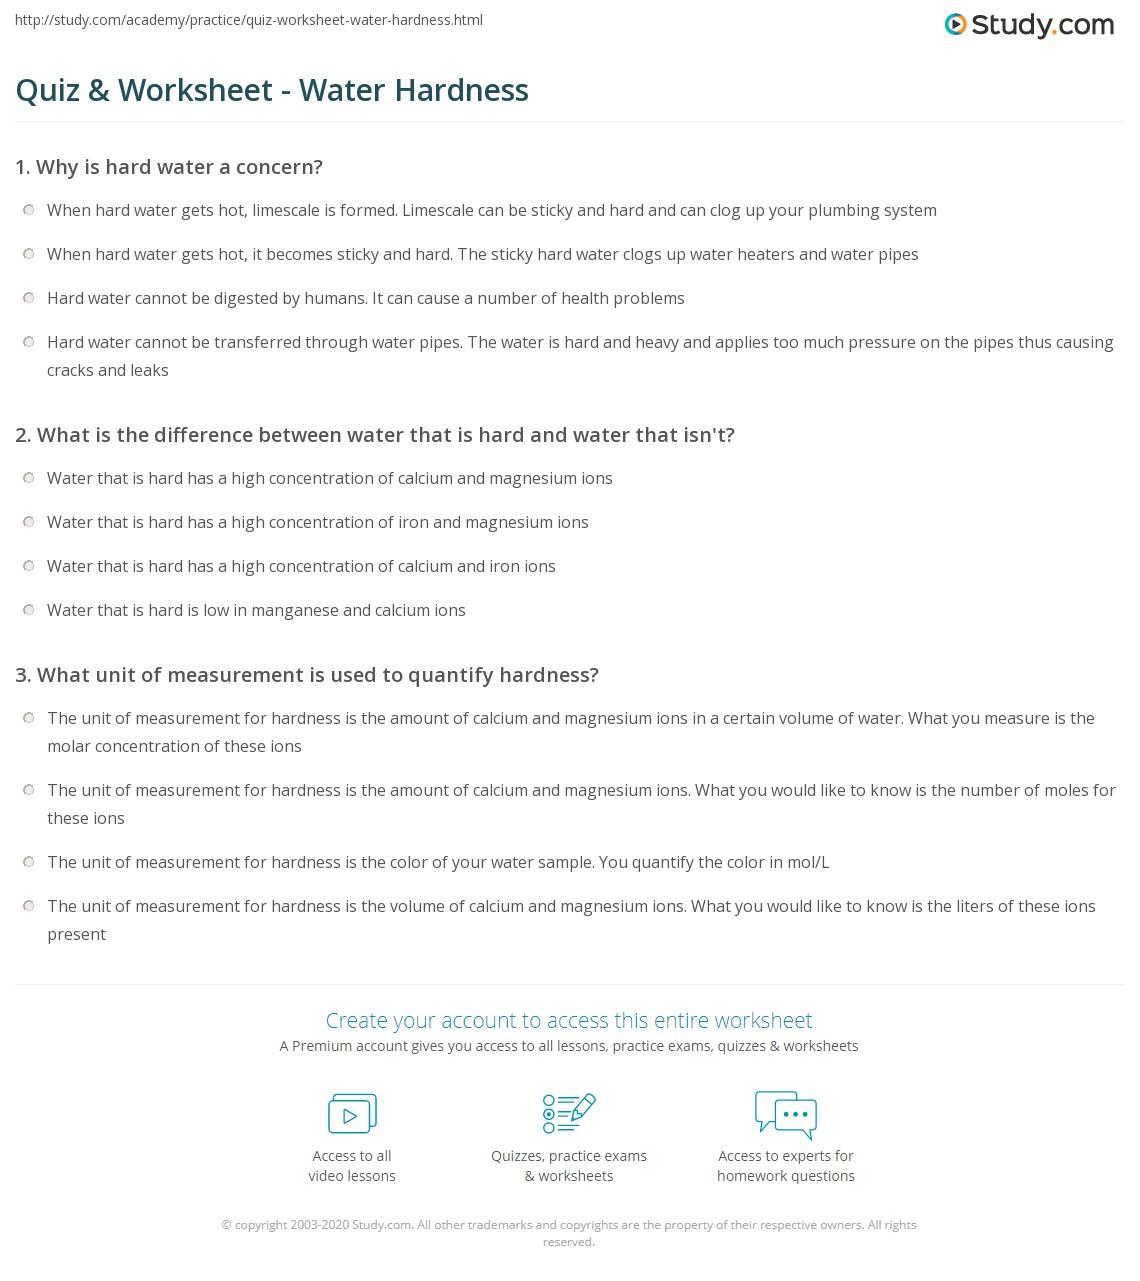 Quiz & Worksheet - Water Hardness | Study.com